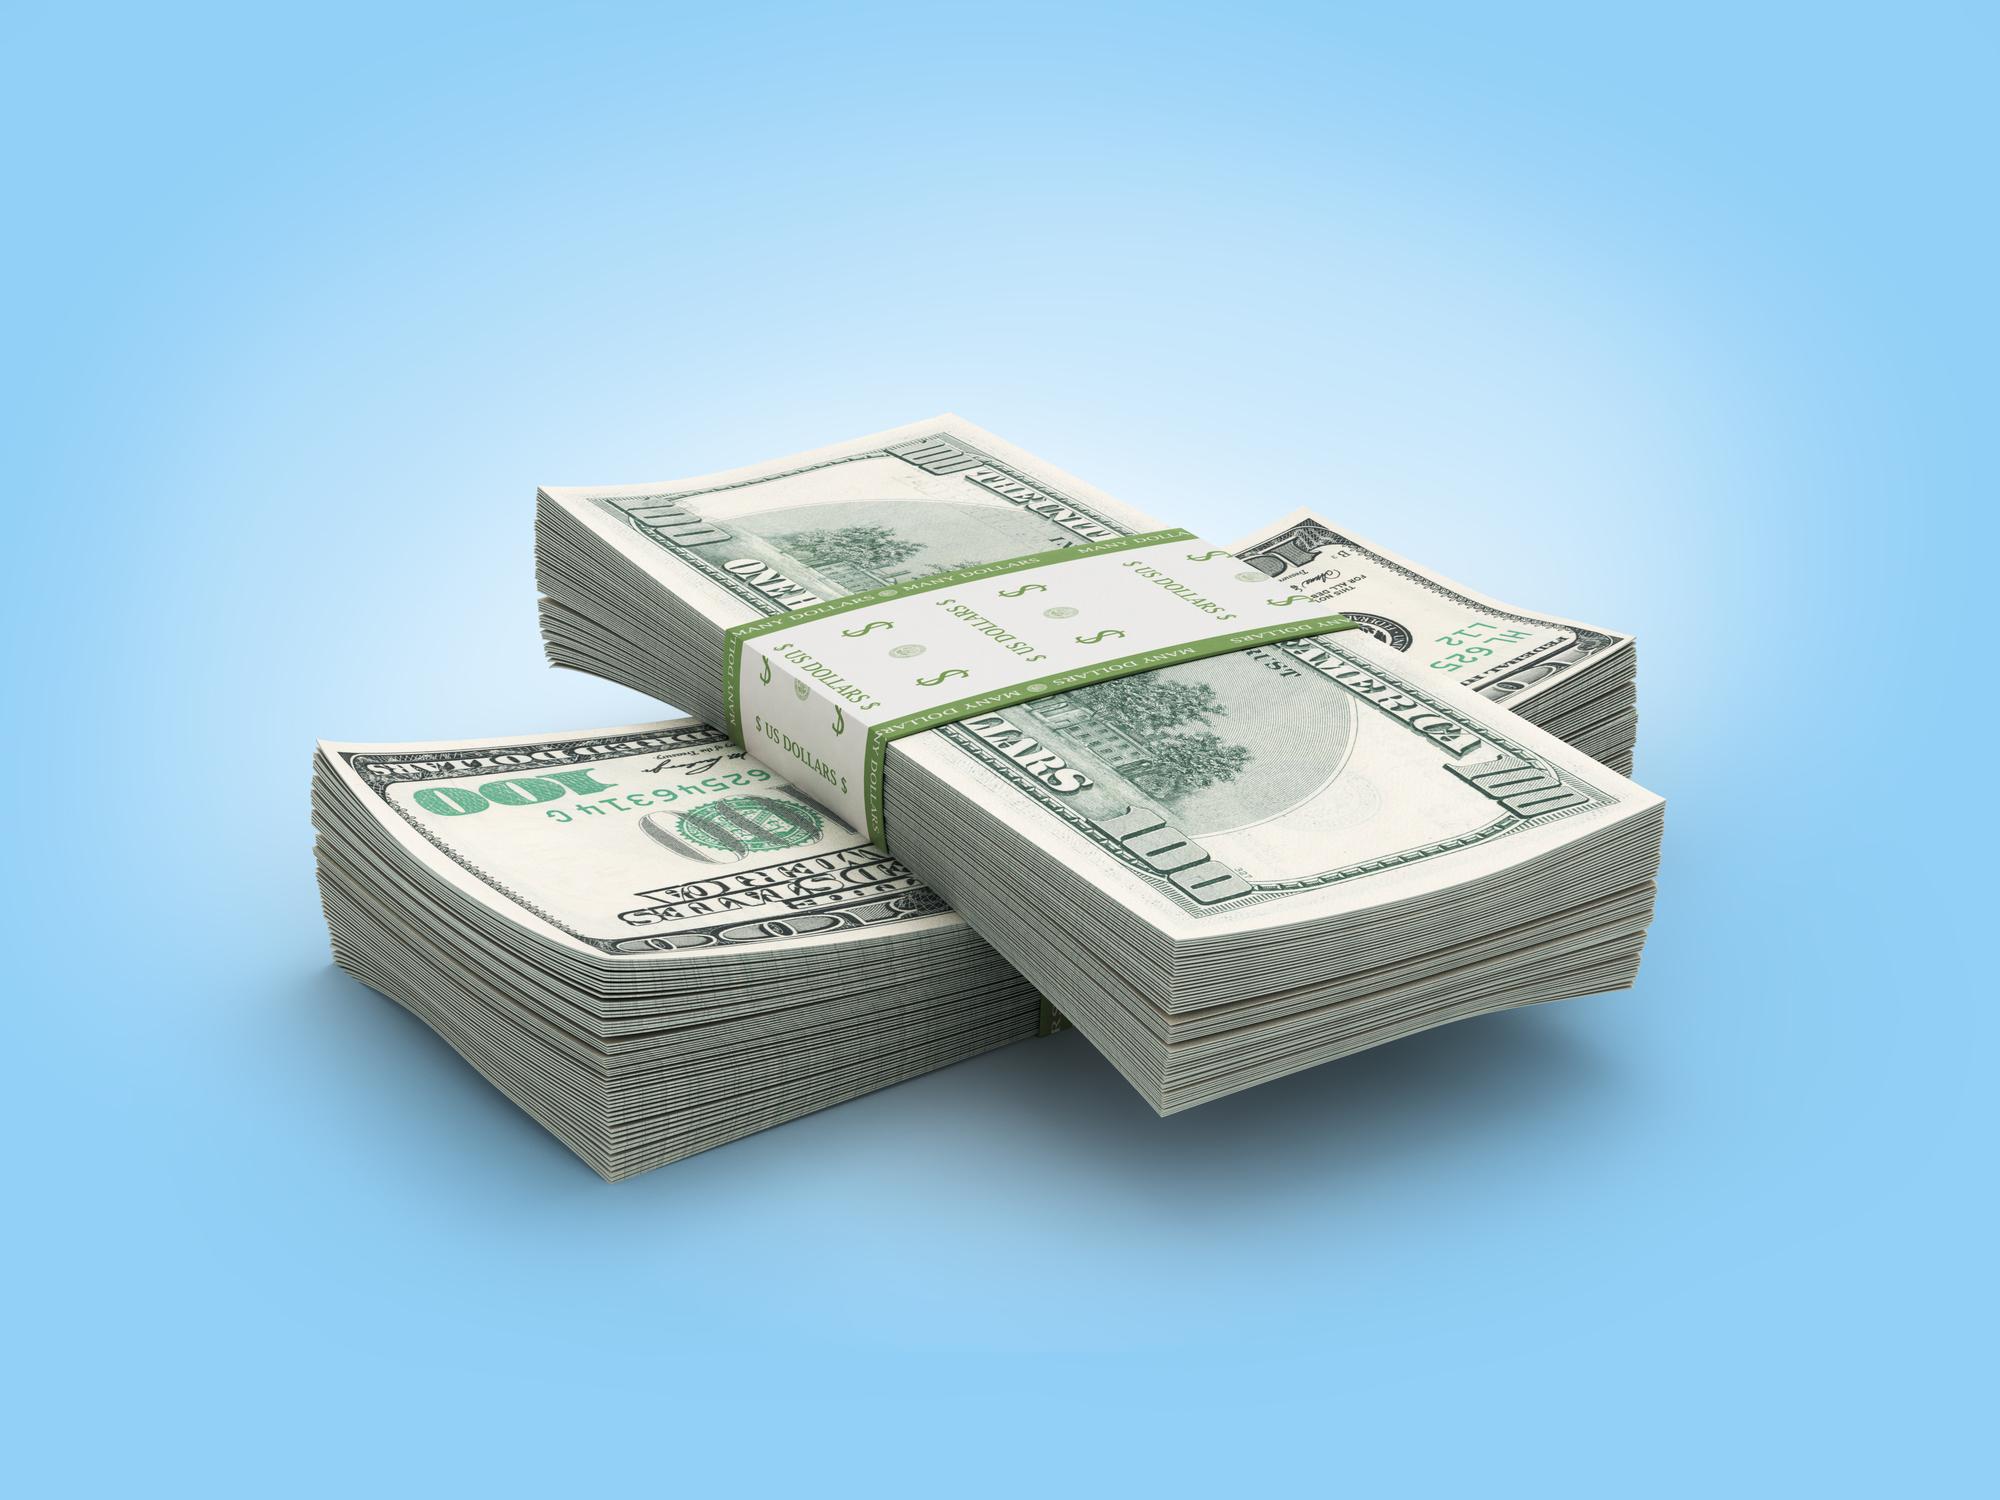 Two criss-crossed stacks of hundred-dollar bills.